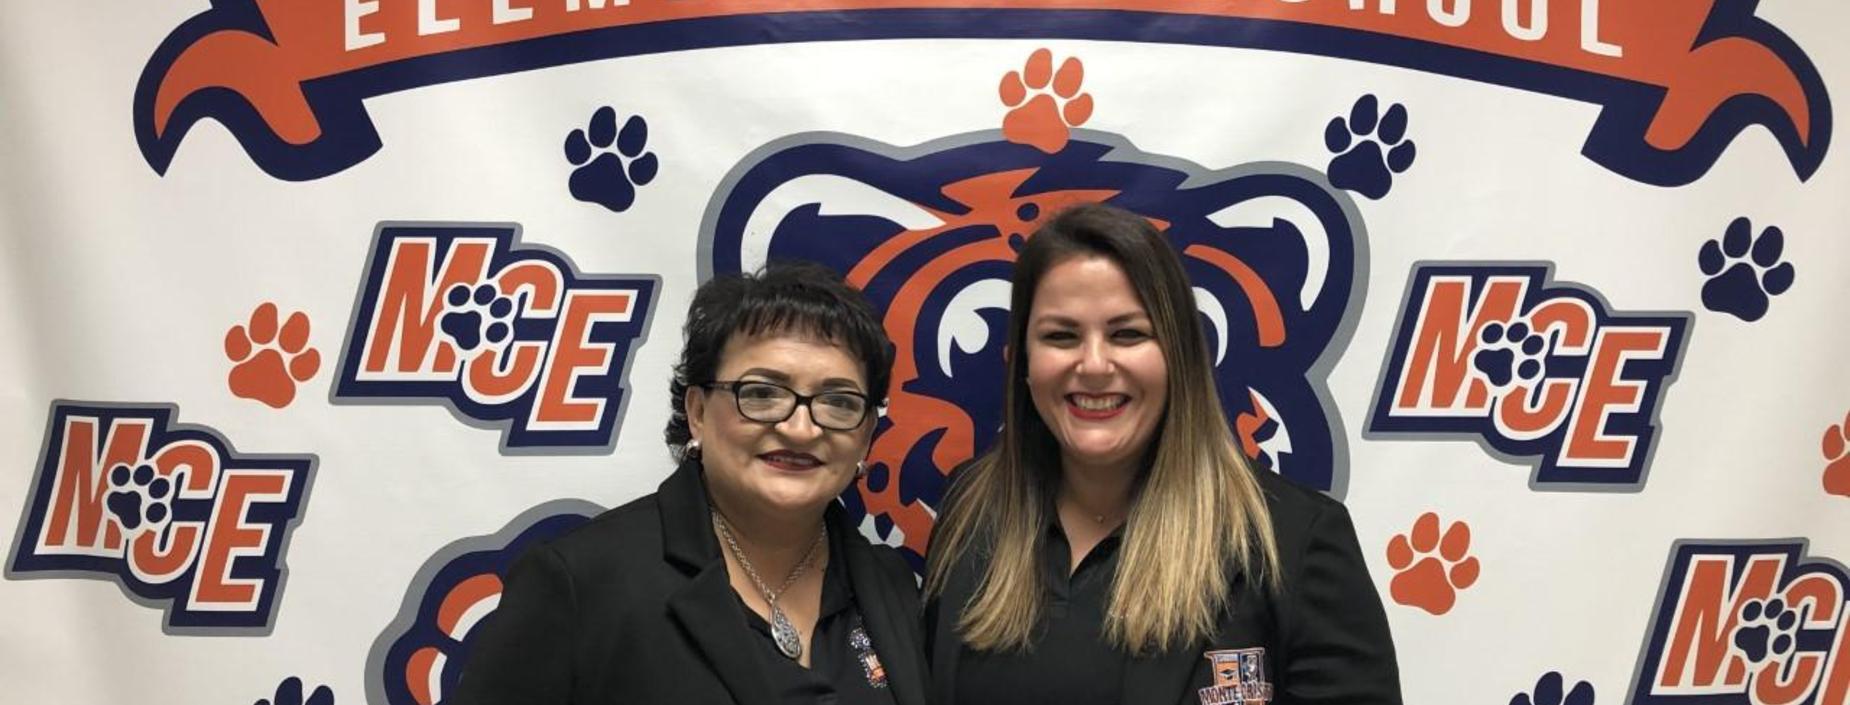 Principal and Assistant Principal